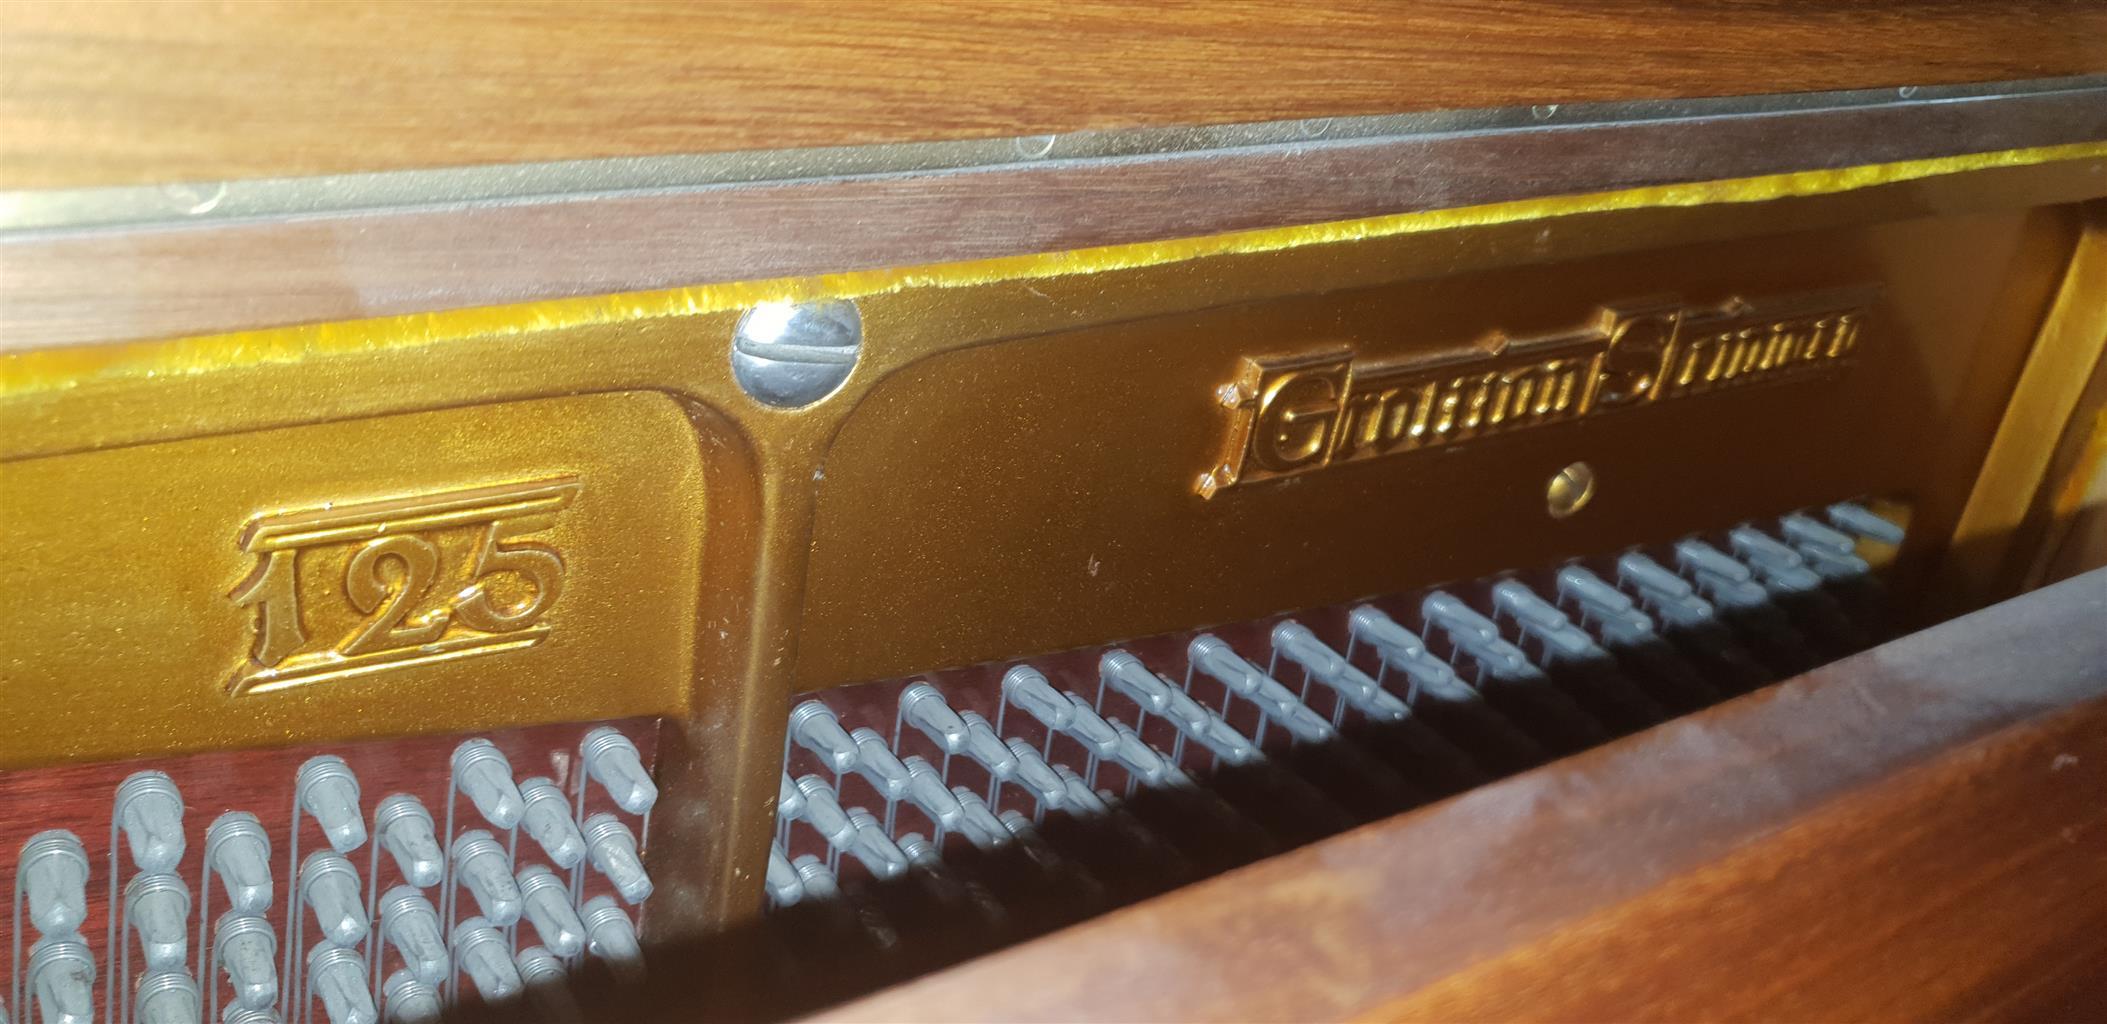 Grotrian Steinweg Upright Piano 1923